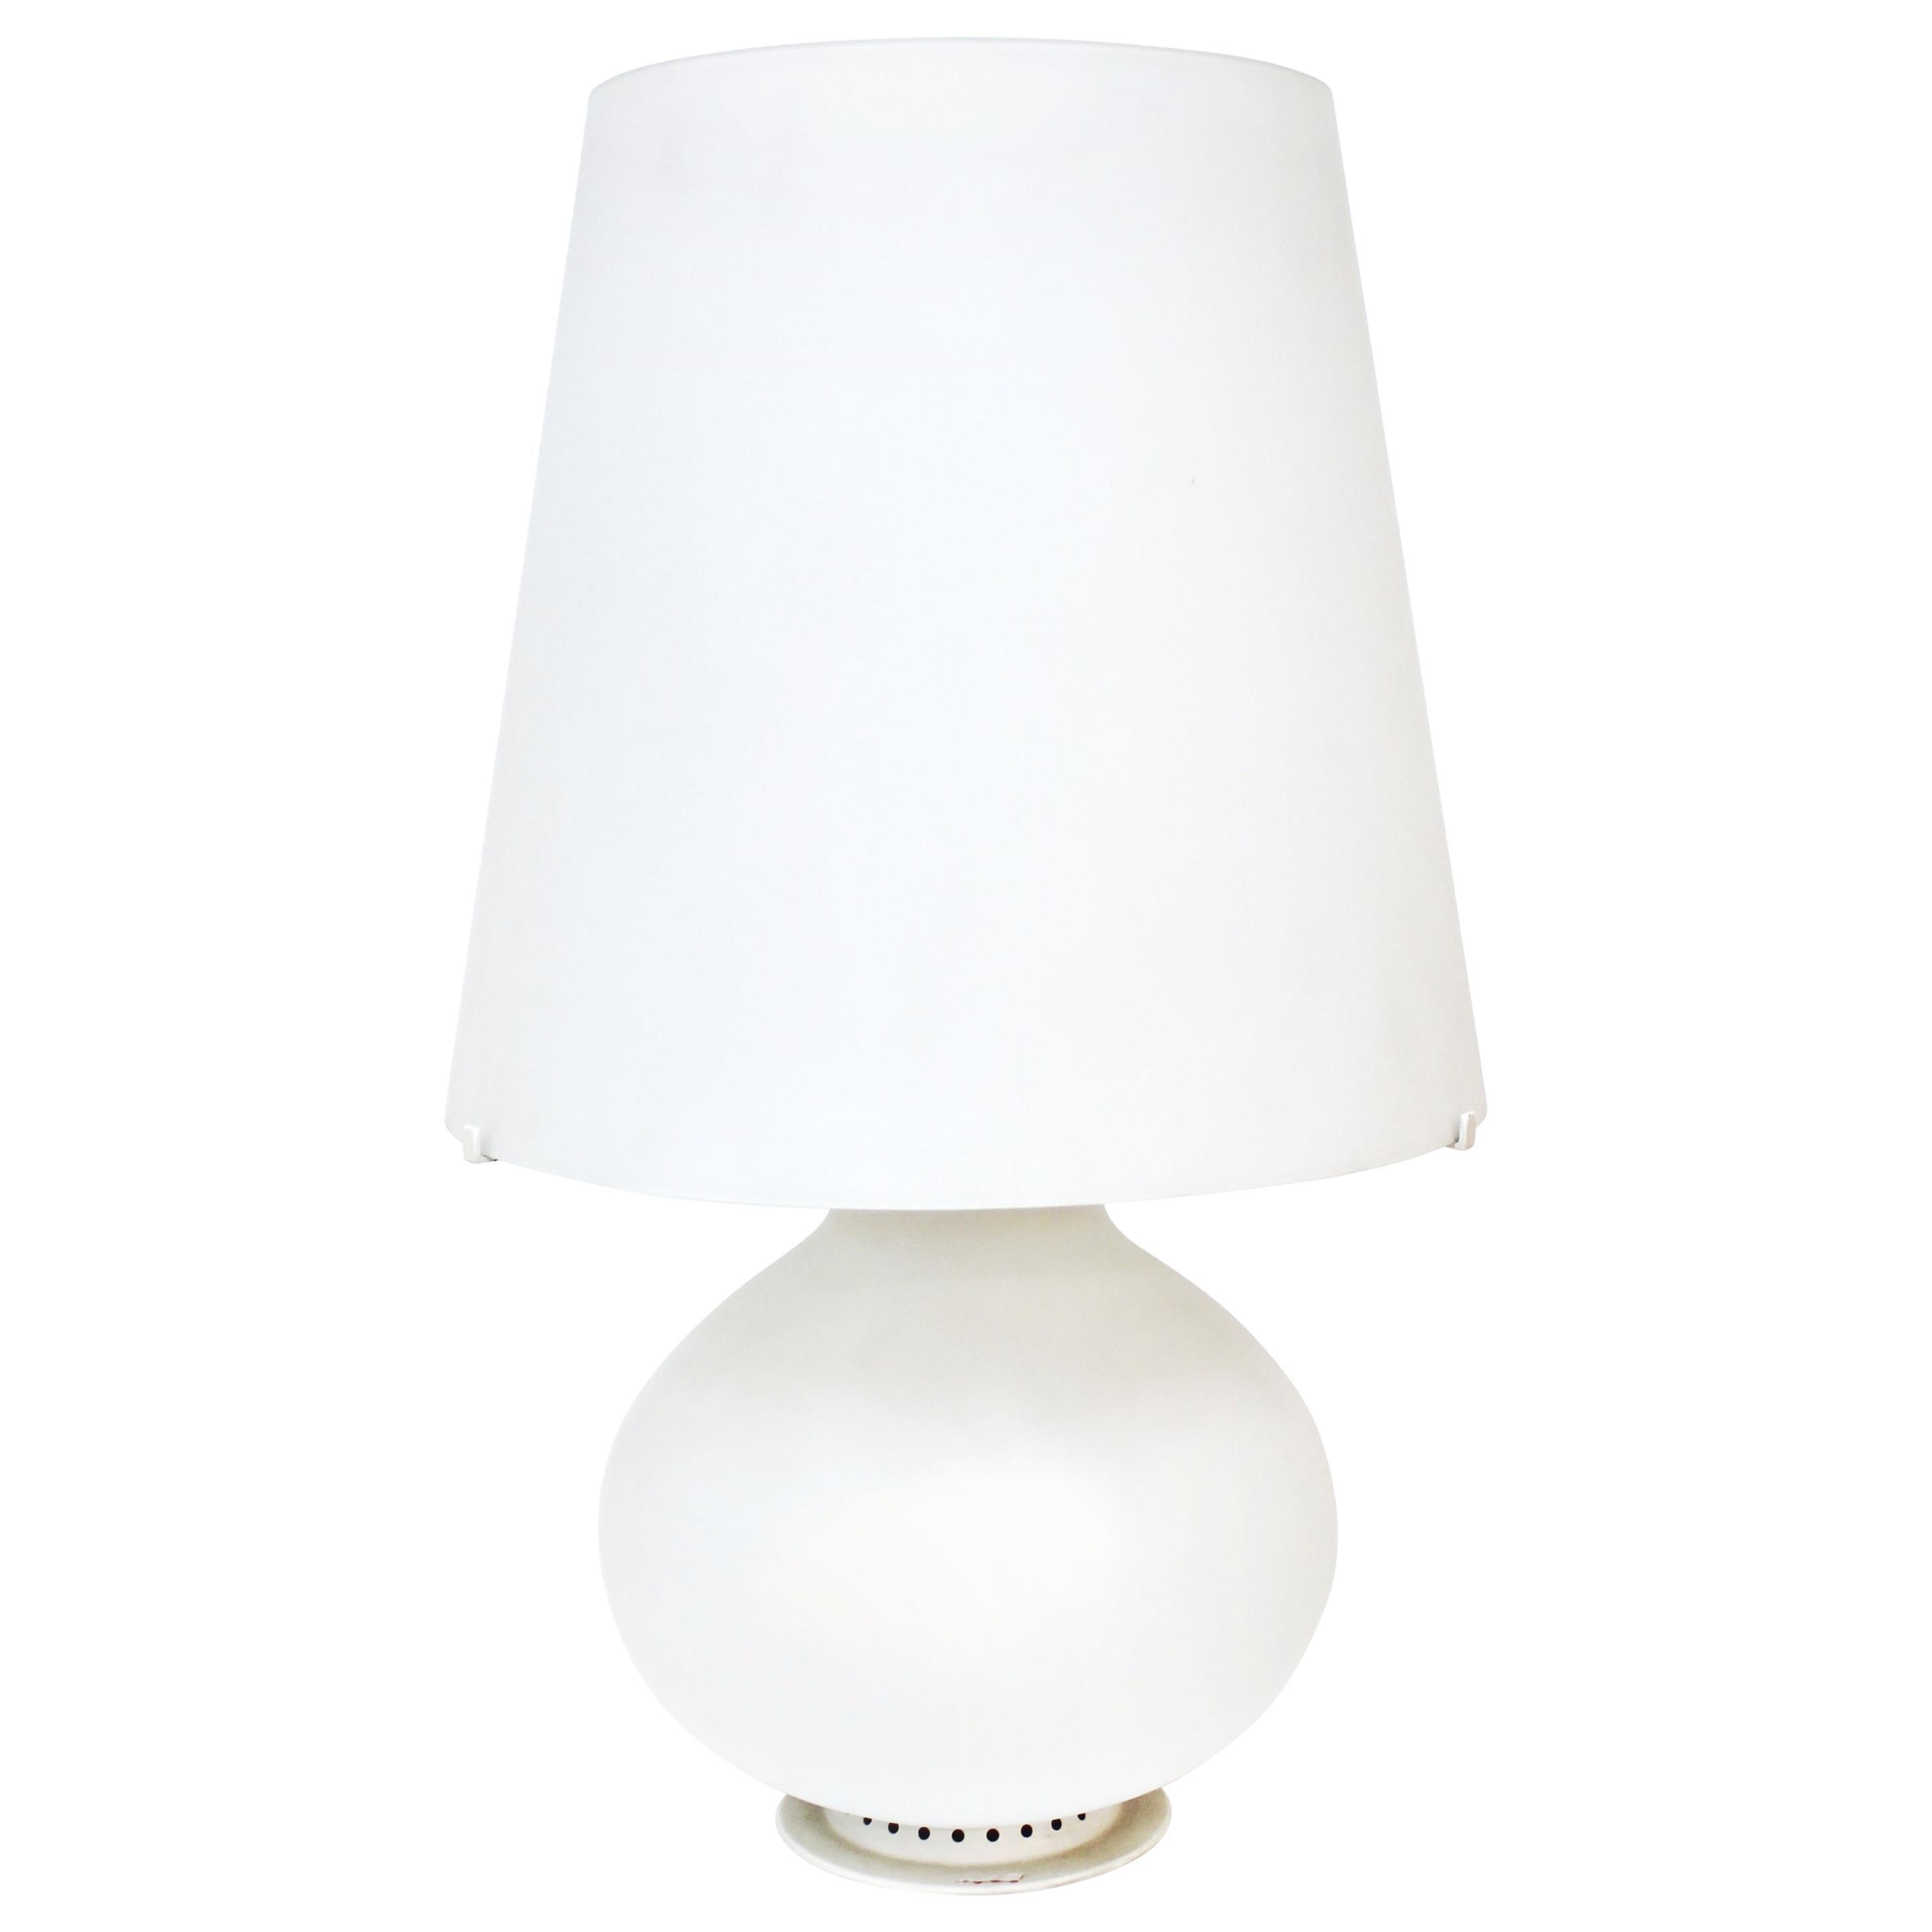 Fontana Table Lamp